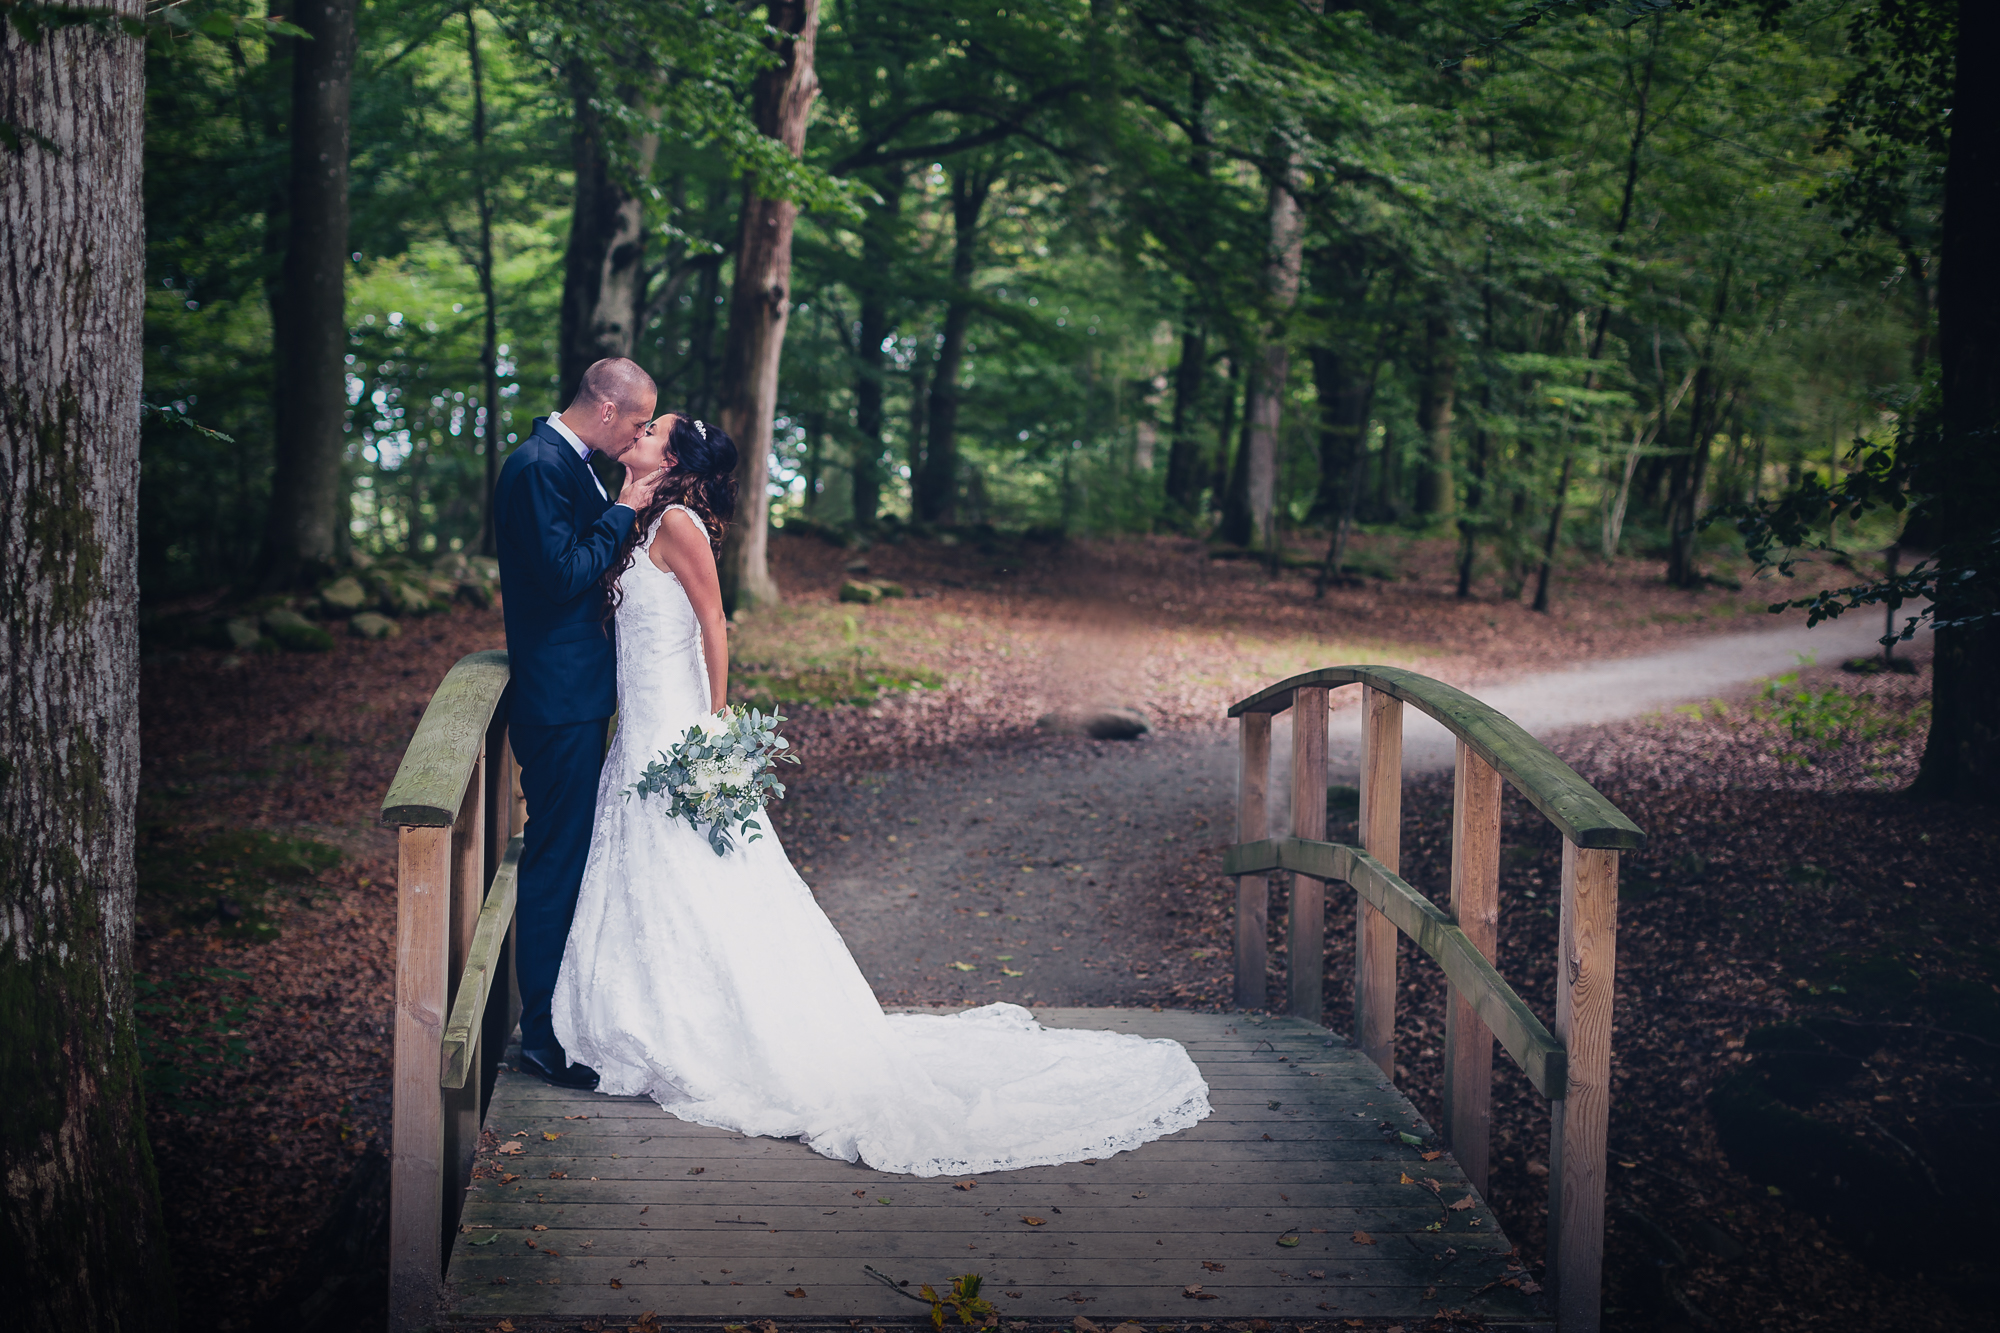 Bröllopsfoto - Guldpaket